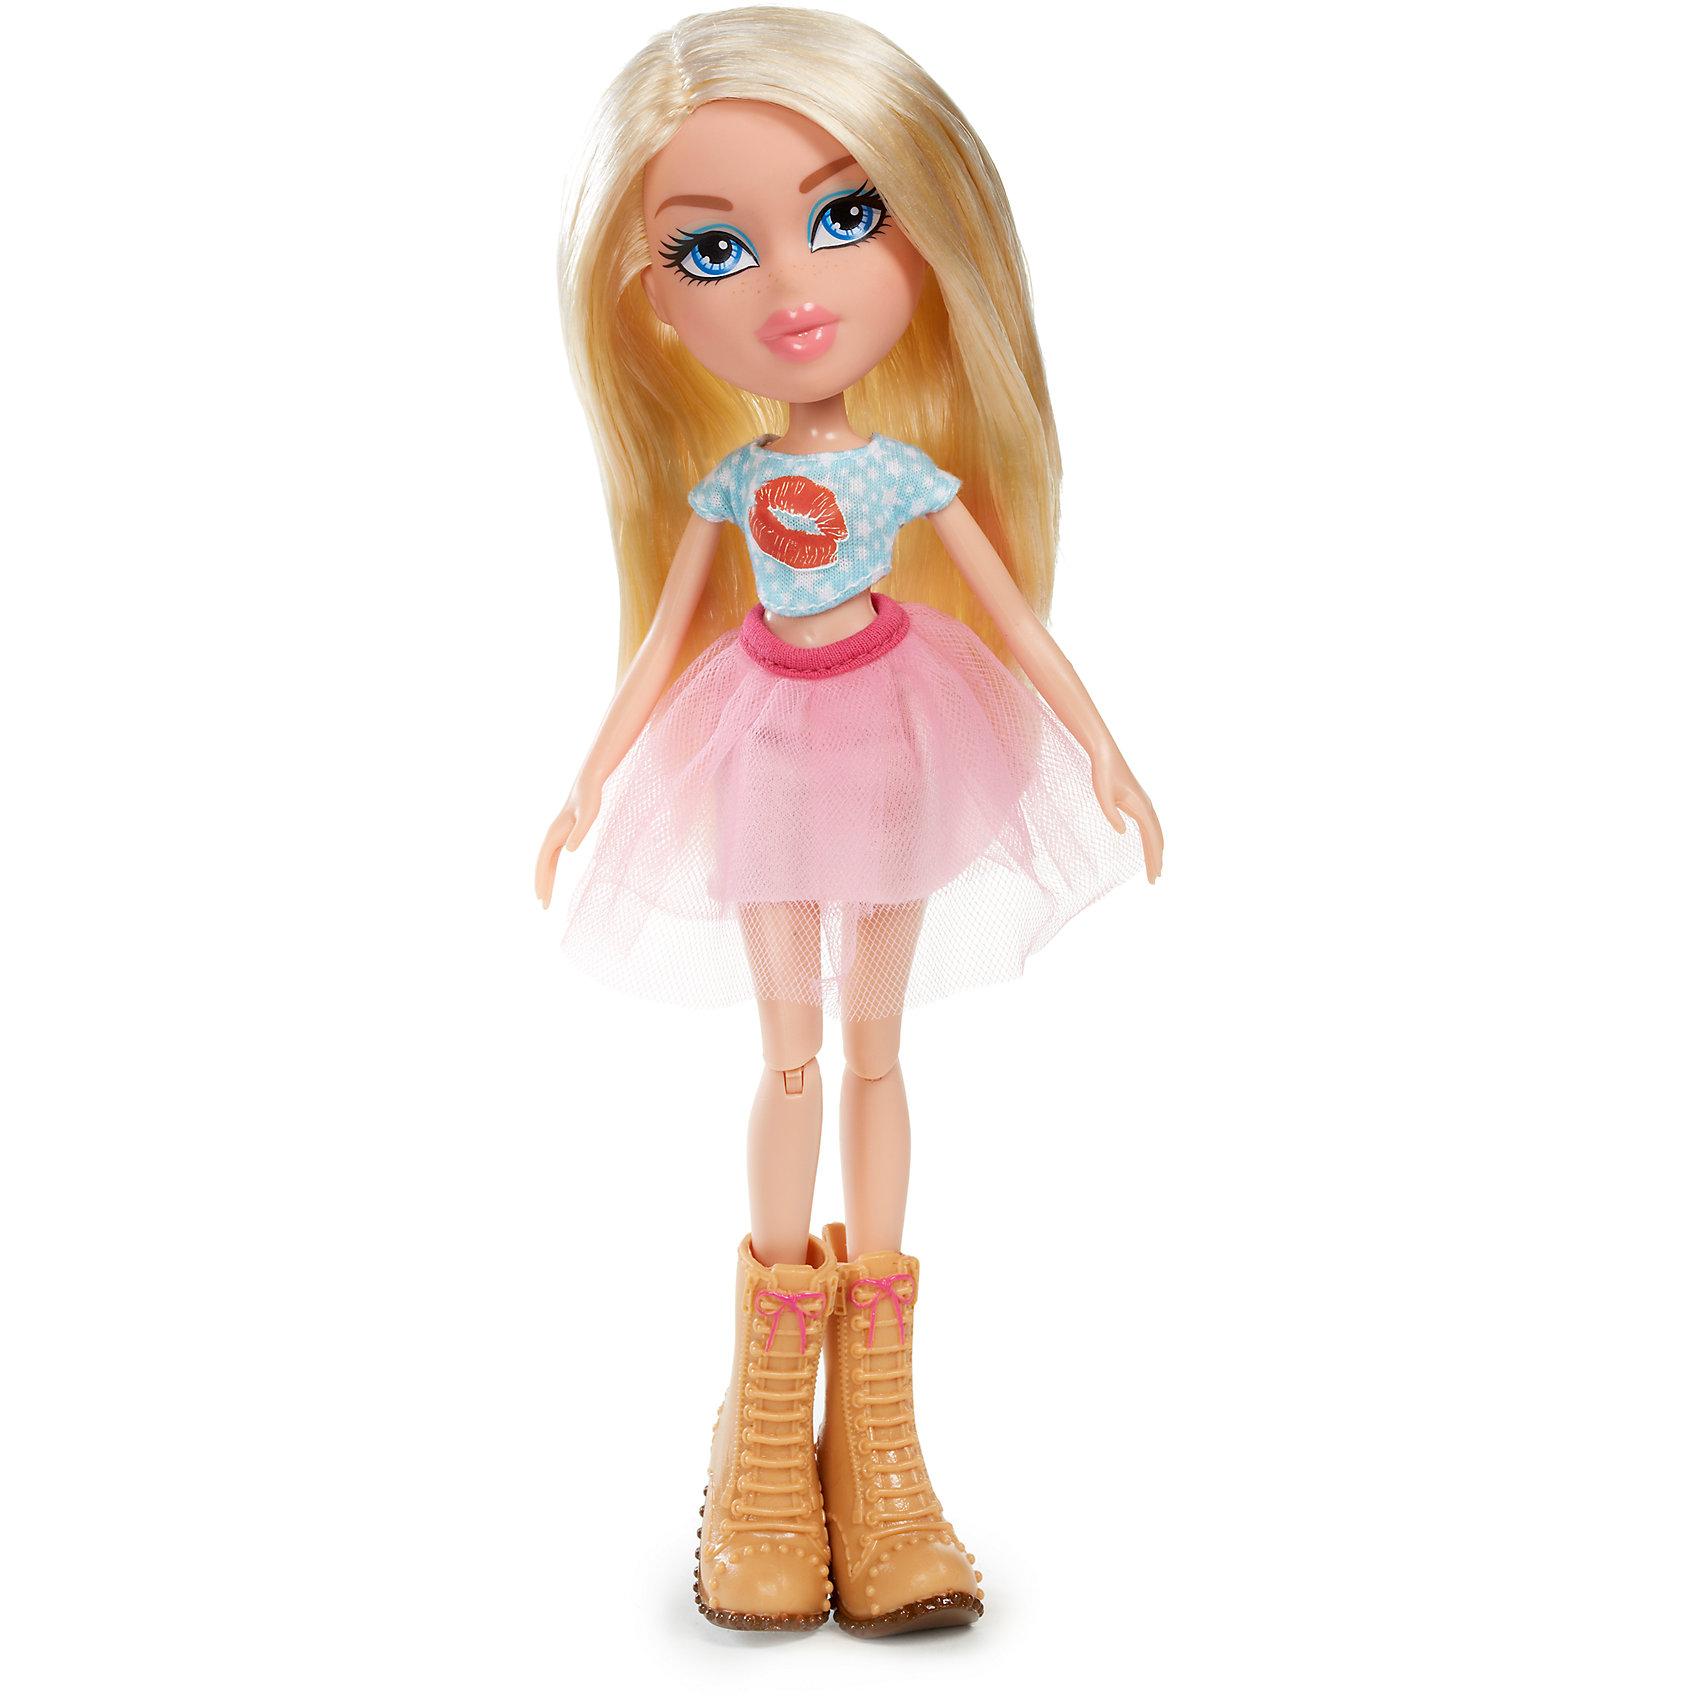 BRATZ Кукла делюкс Хлоя, Диджей, Bratz куклы gulliver кукла дынька 30см